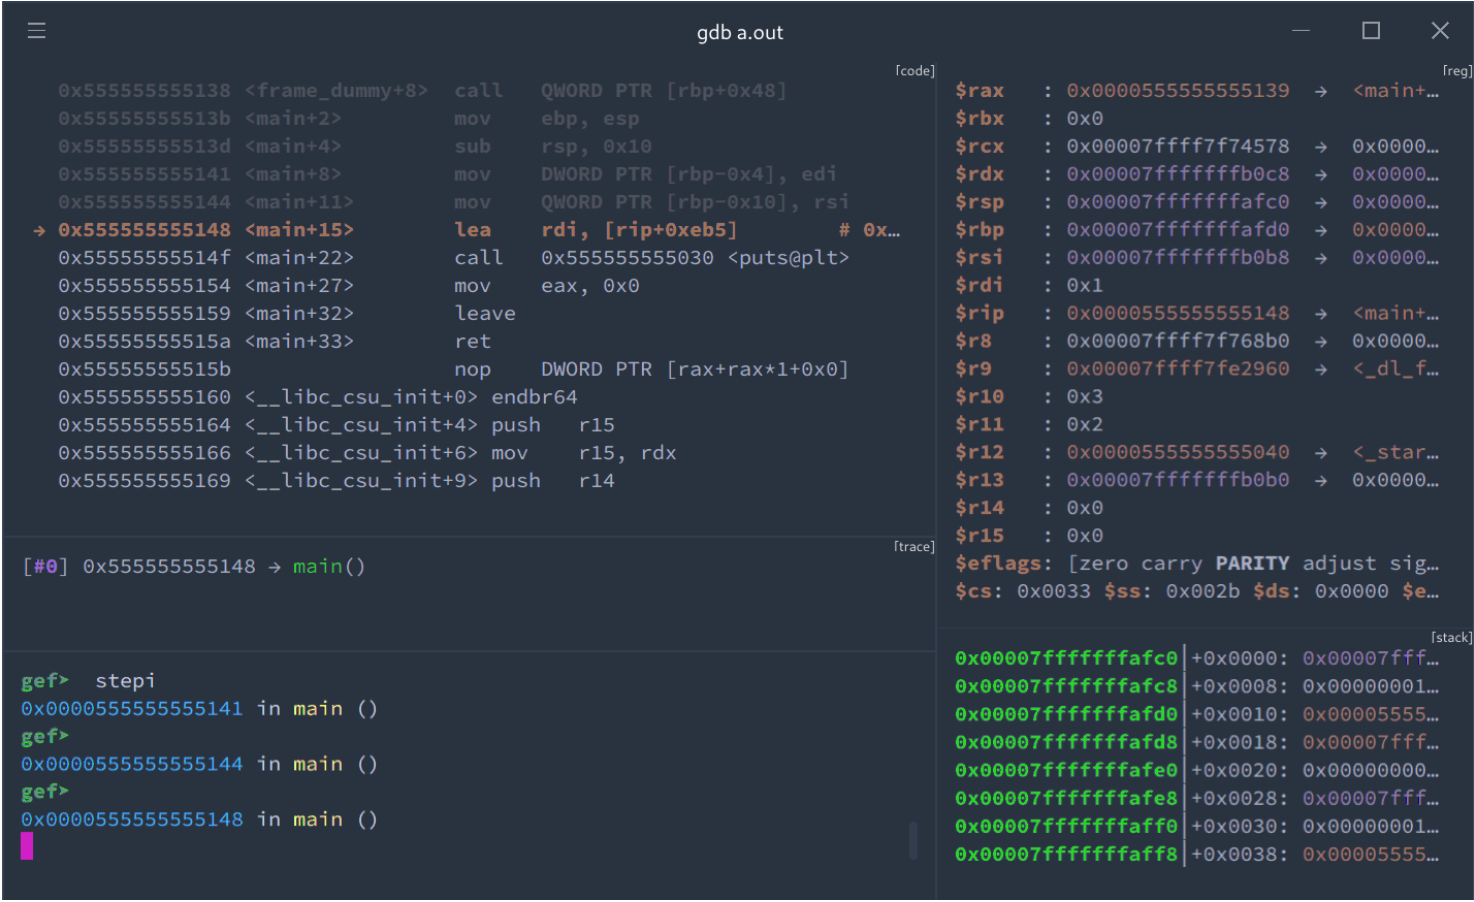 hyperpwn: provide a flexible debugger UI for GEF and pwndbg